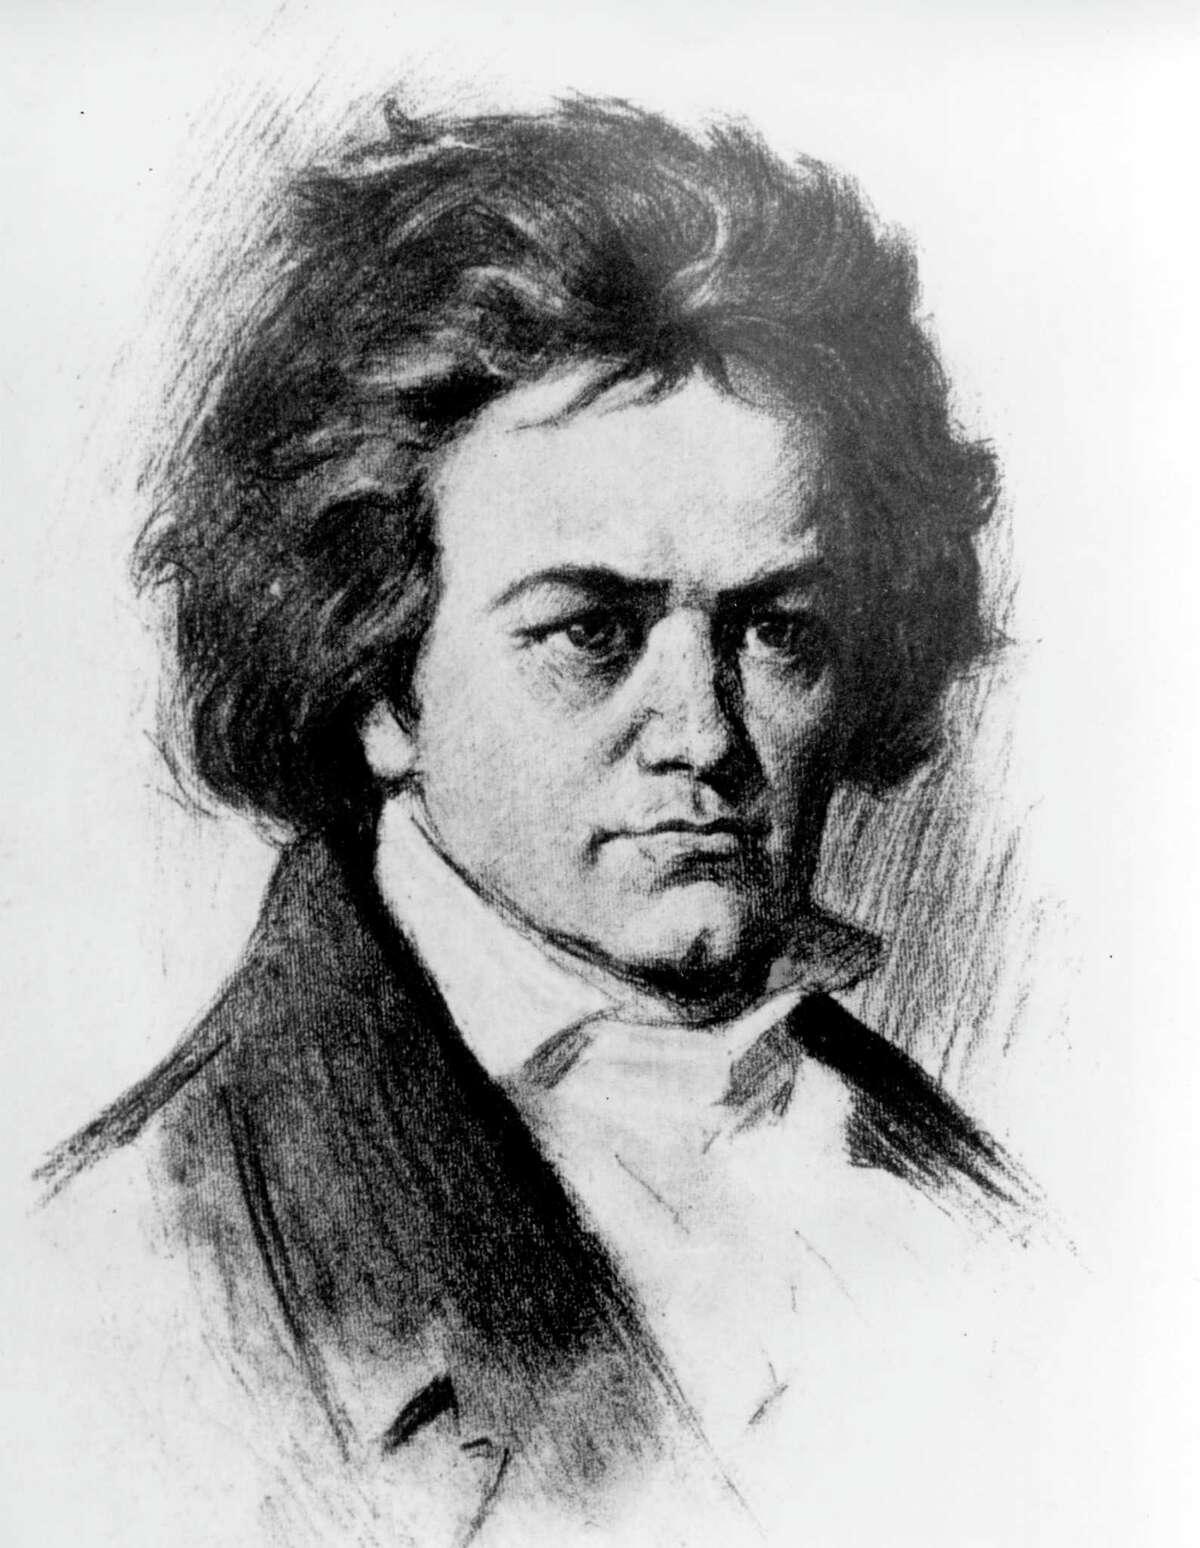 This is an undated sketch of German composer Ludwig van Beethoven.